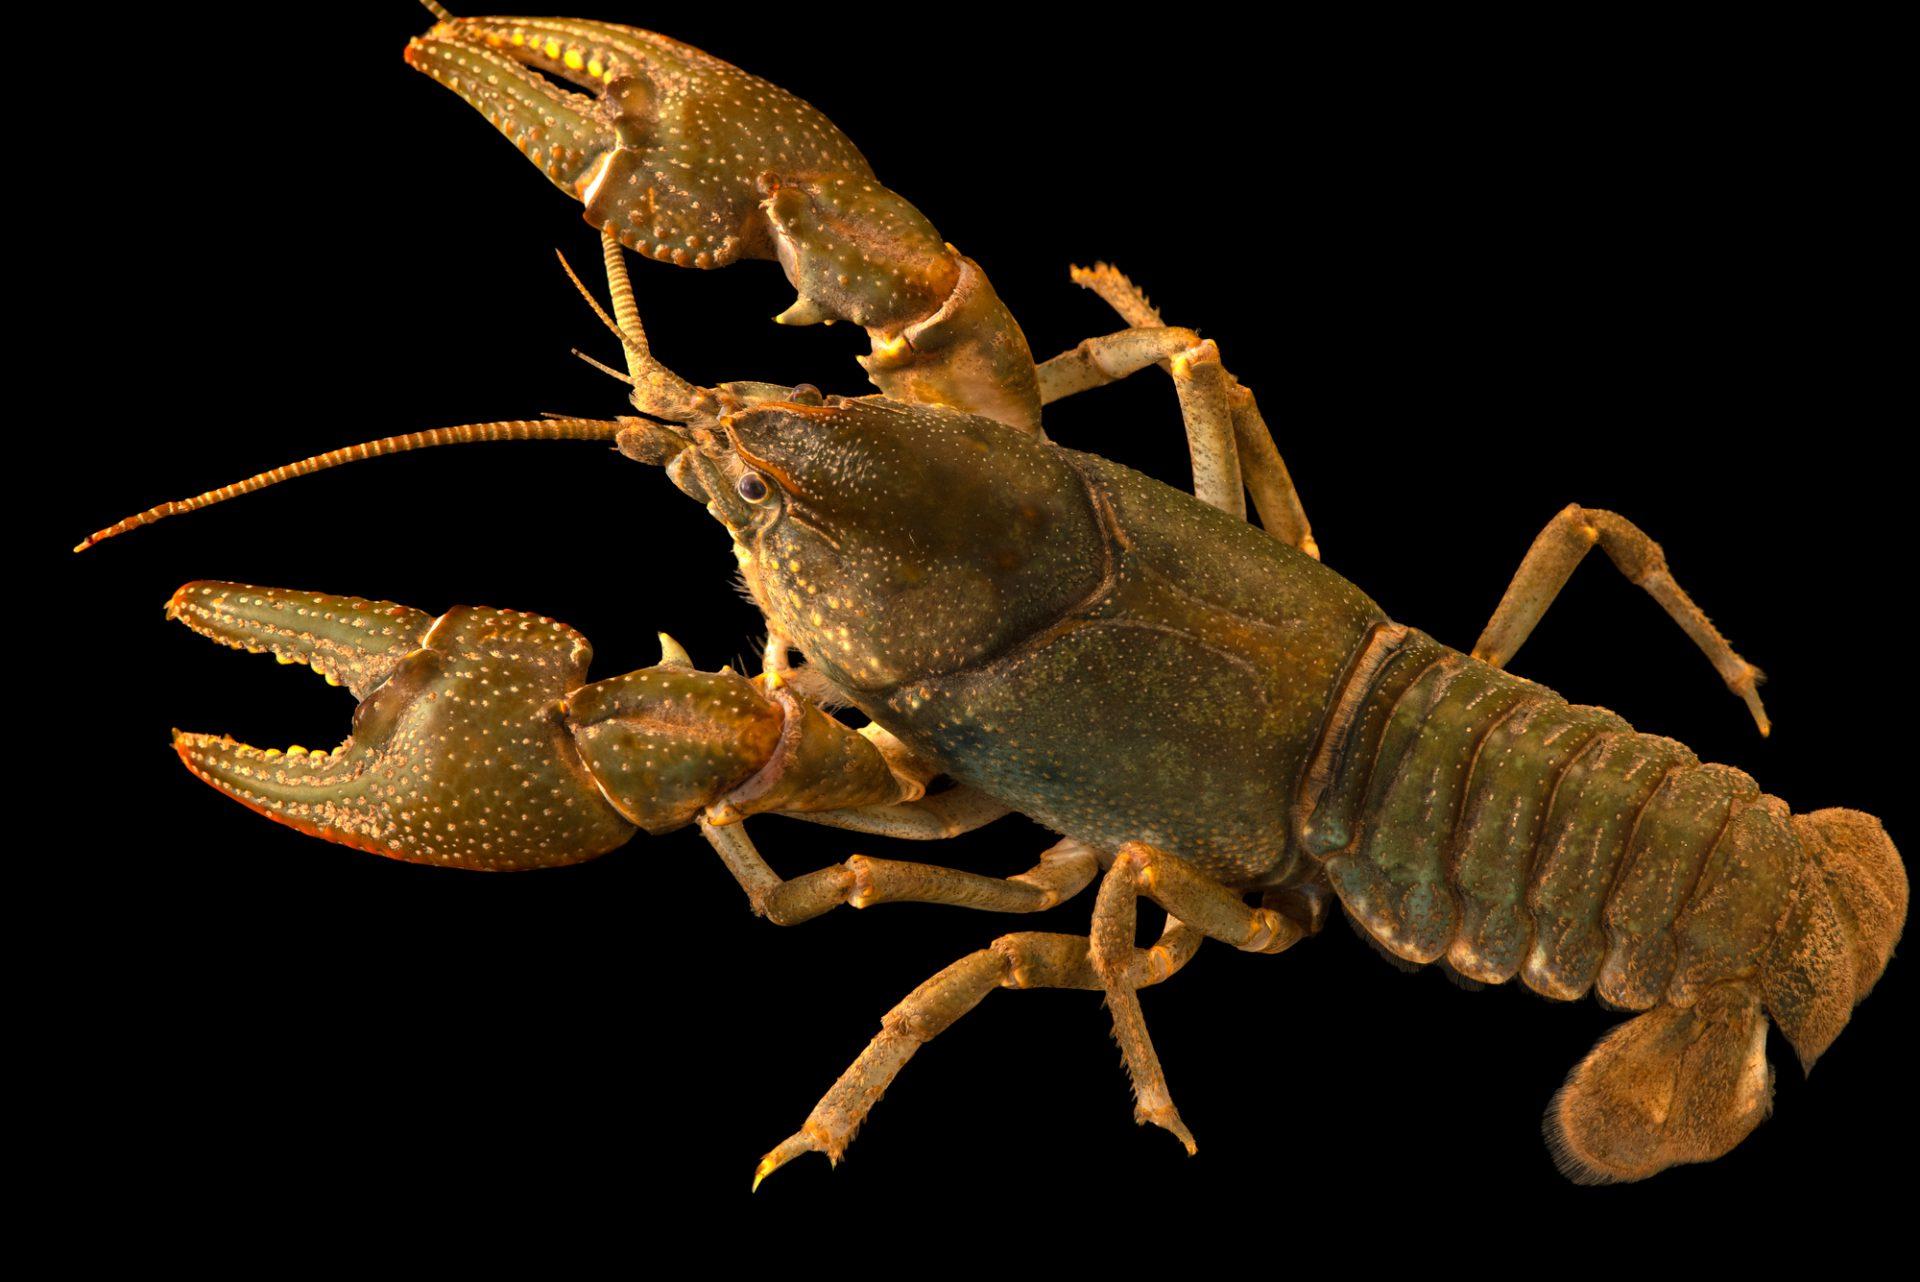 Photo: Common crayfish (Cambarus bartonii) from the wild.